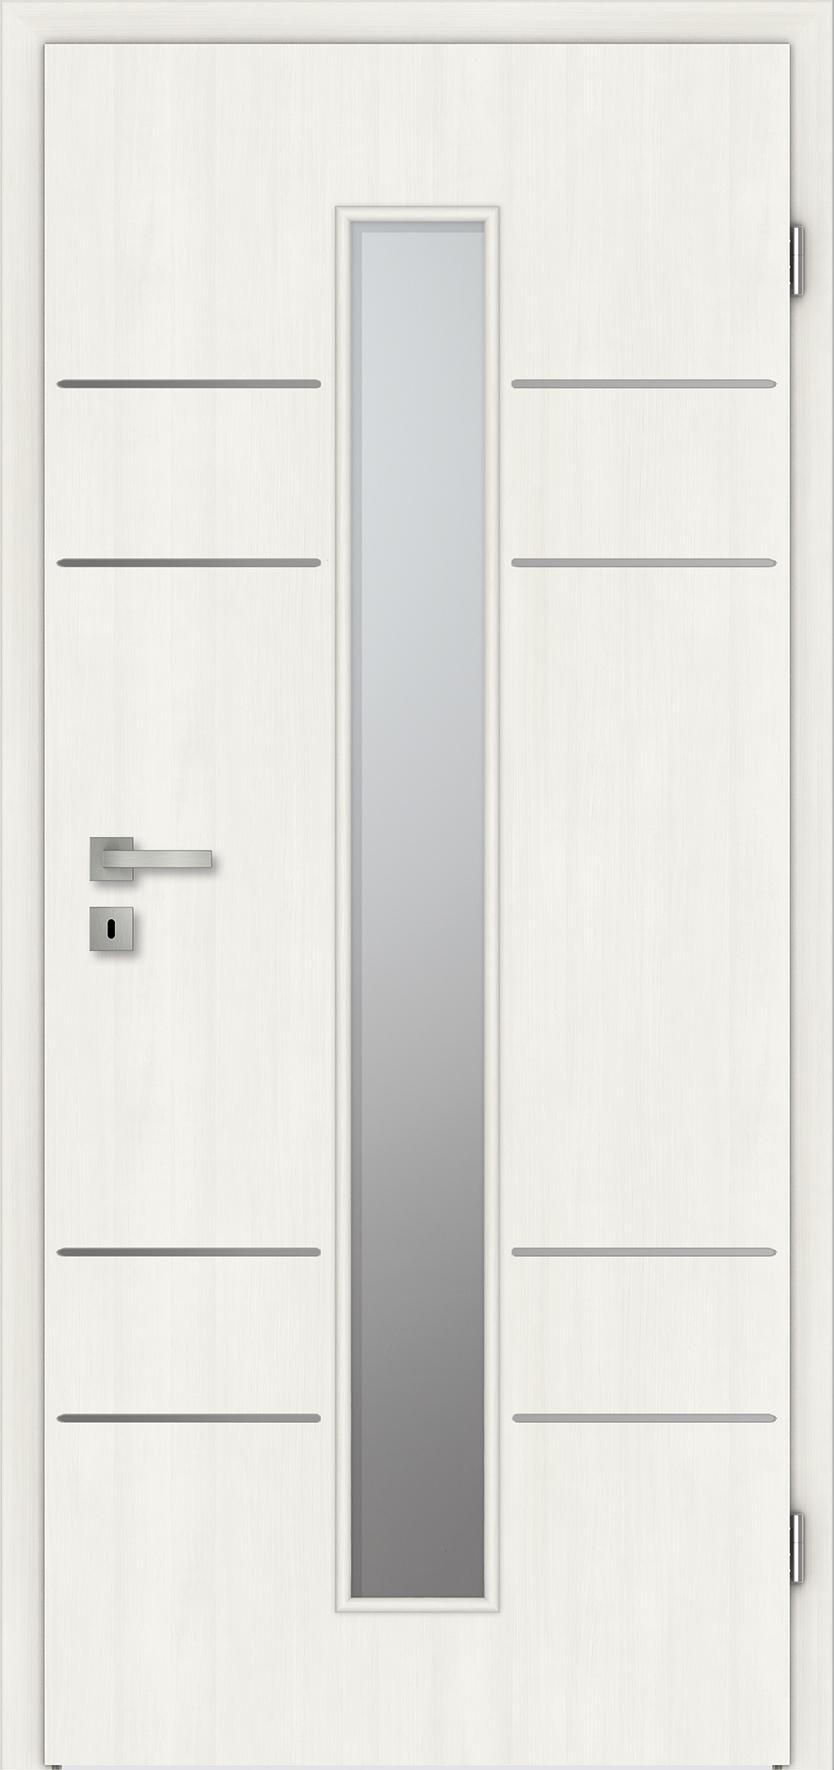 RY-552-LA2-DA_CPL Touch Whiteline